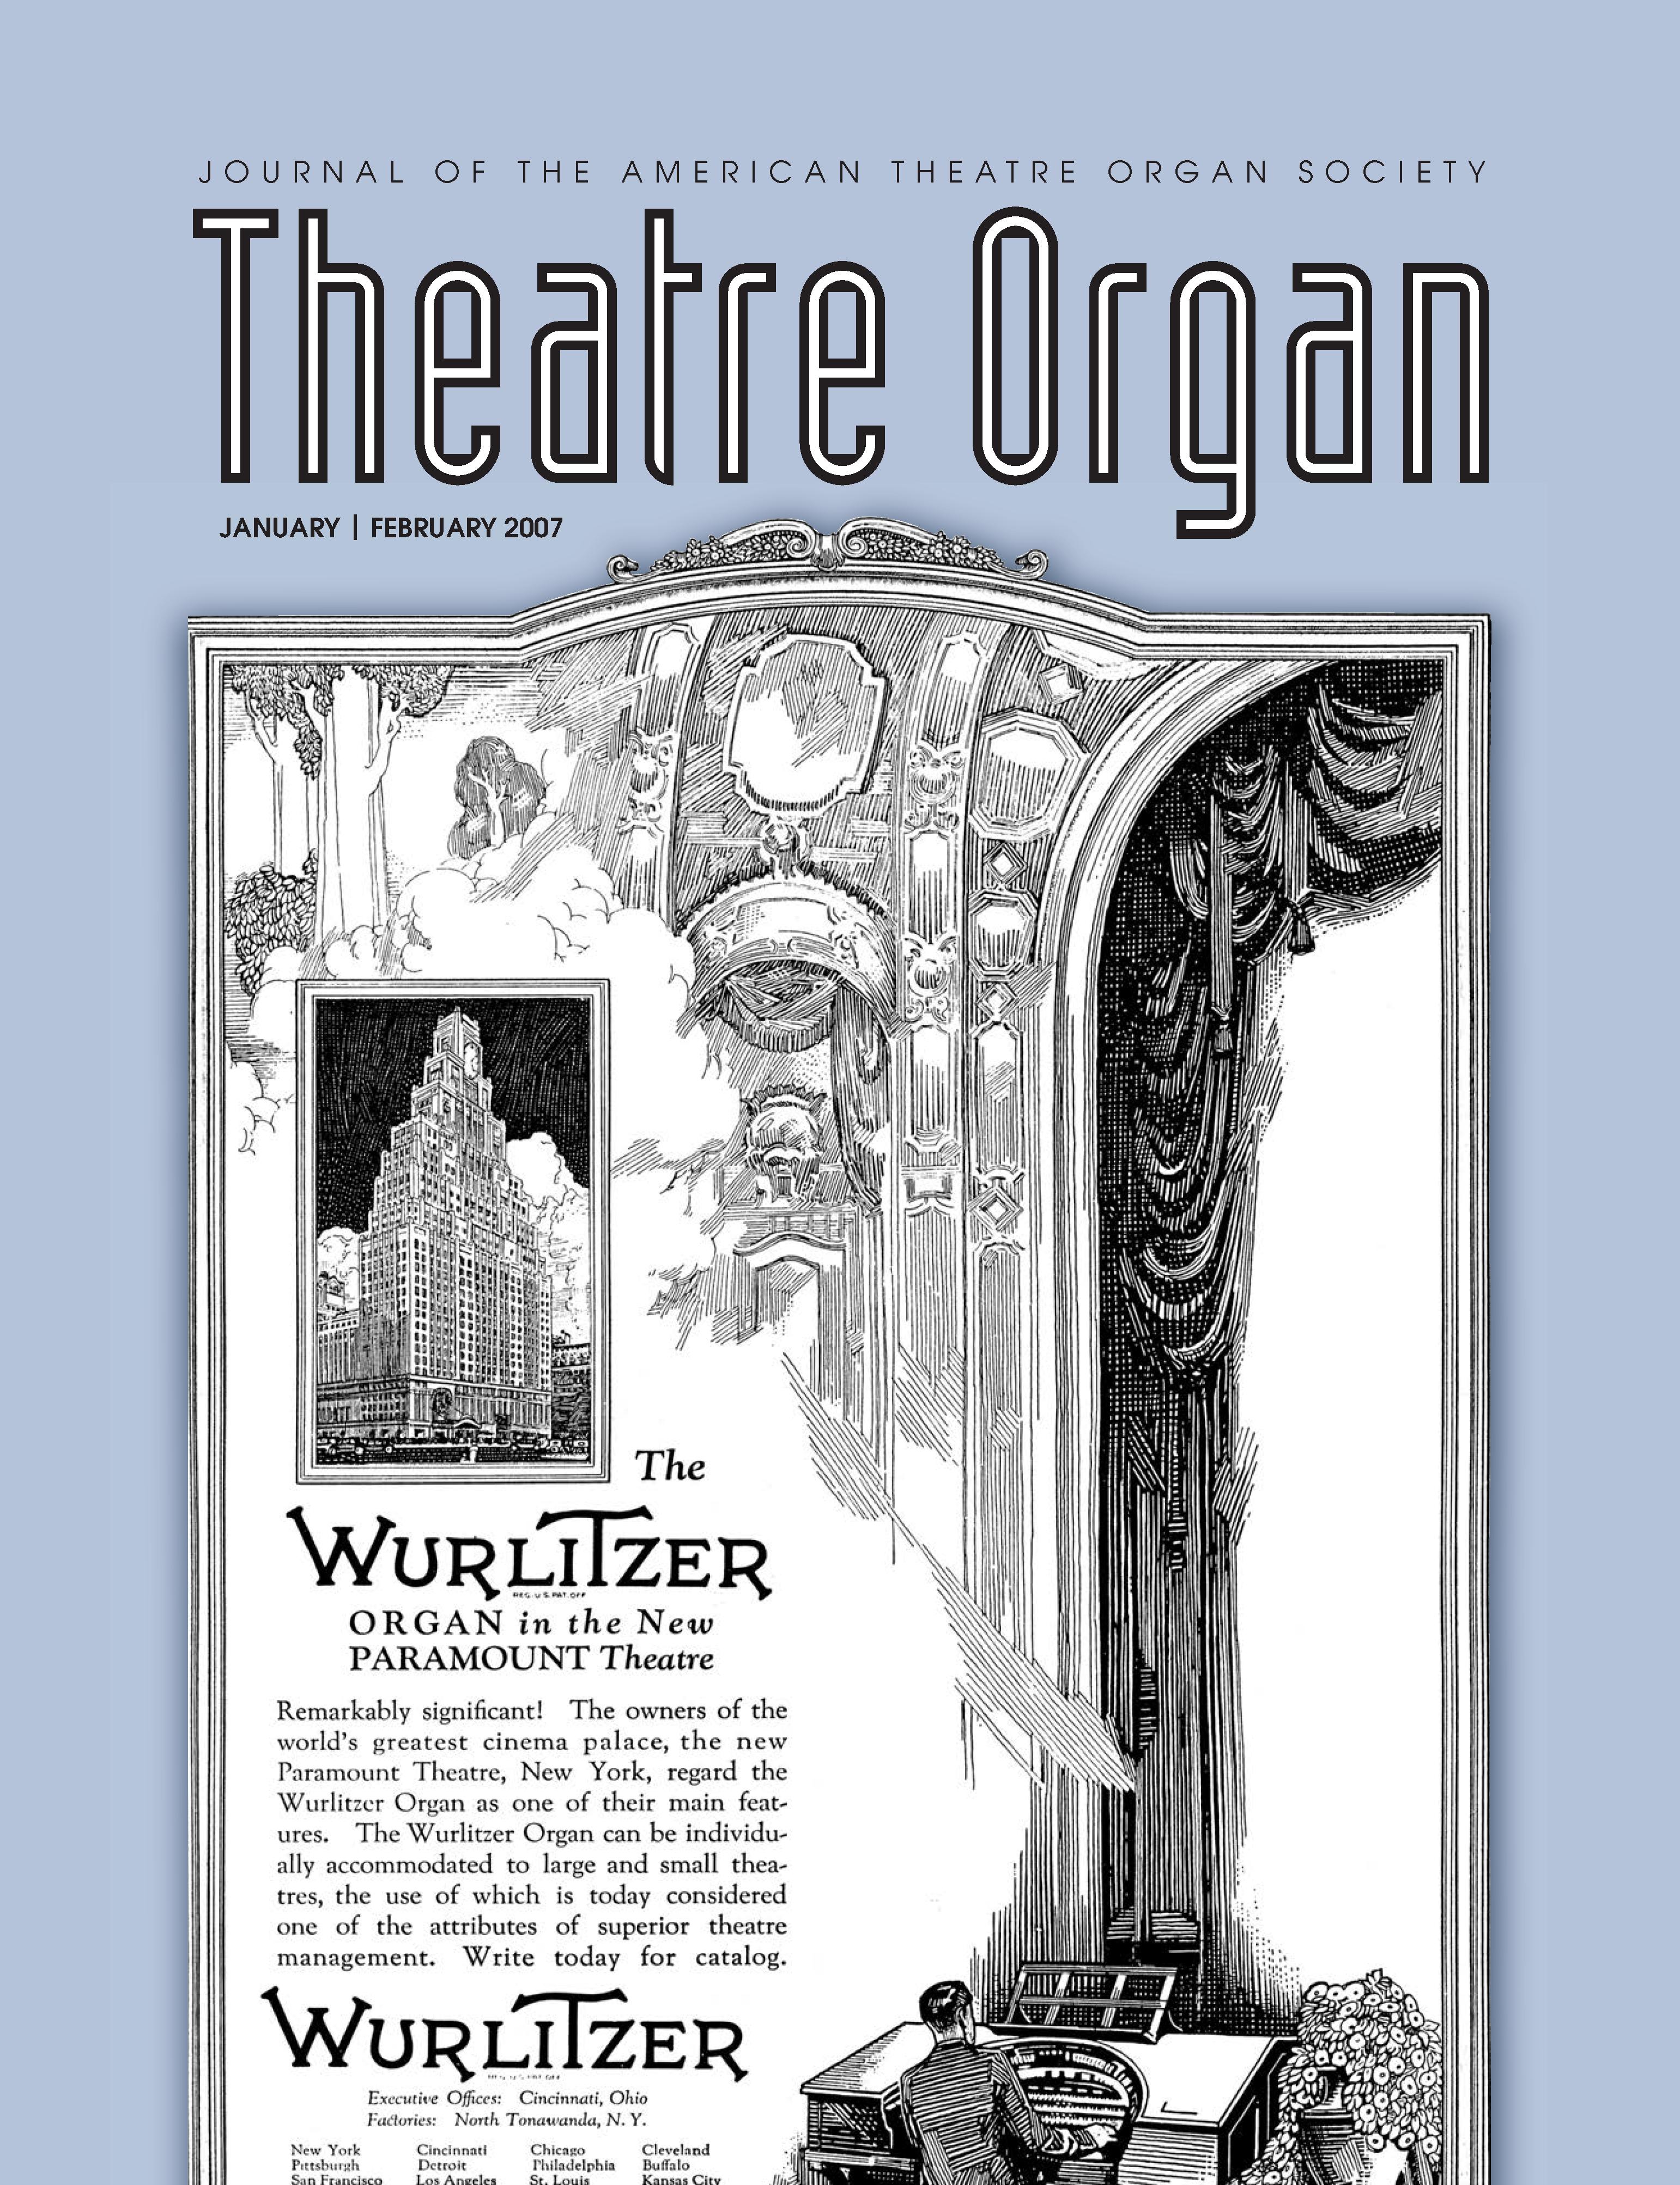 Theatre Organ, January - February 2007, Volume 49, Number 1